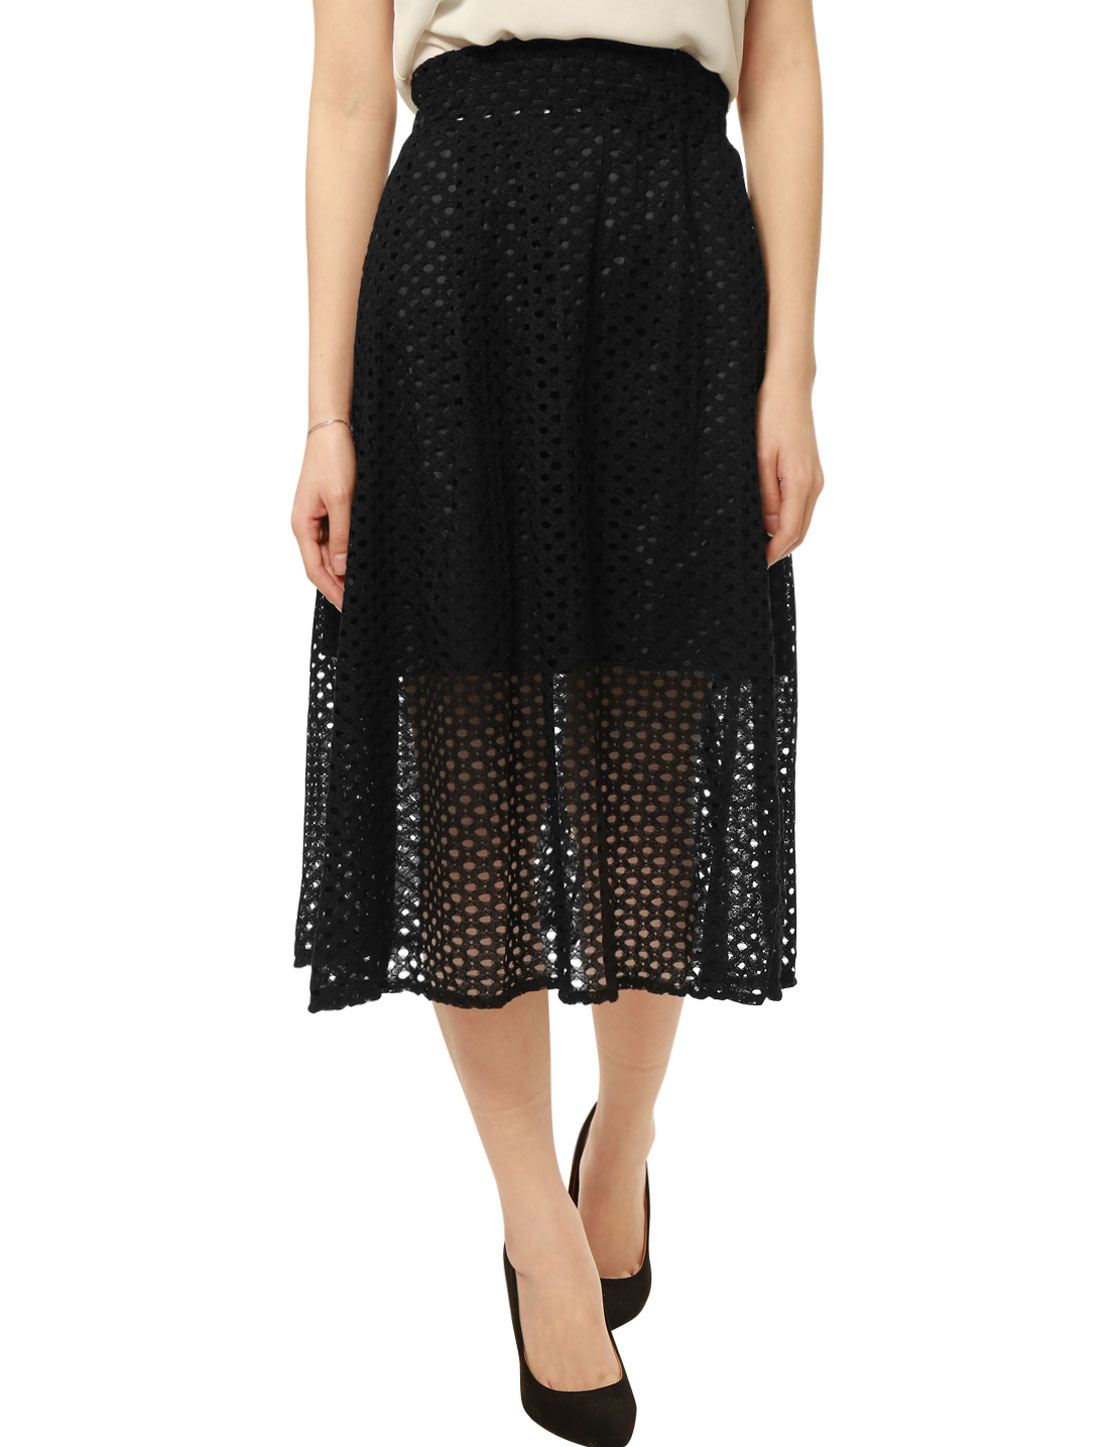 Women Elastic Waist Band Semi Sheer Hem Lace Midi Skirt Black XS